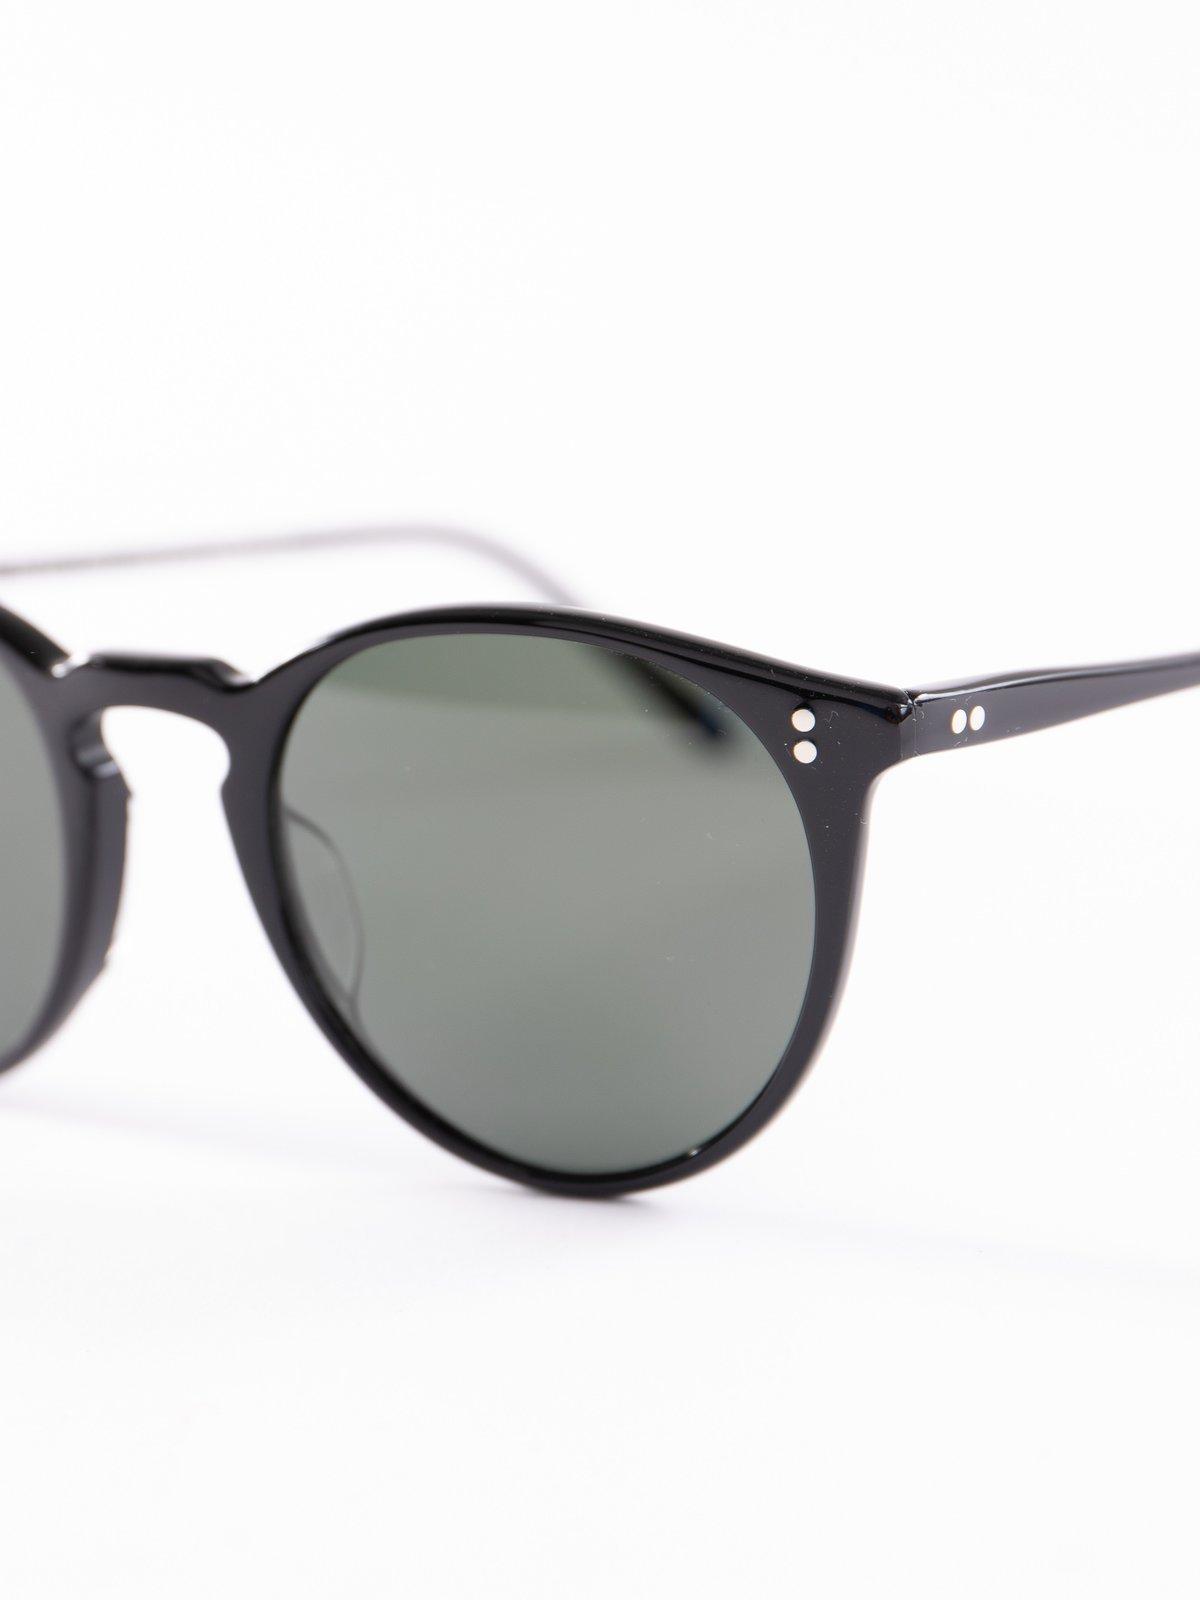 Black/Grey Polar O'Malley Sunglasses - Image 3